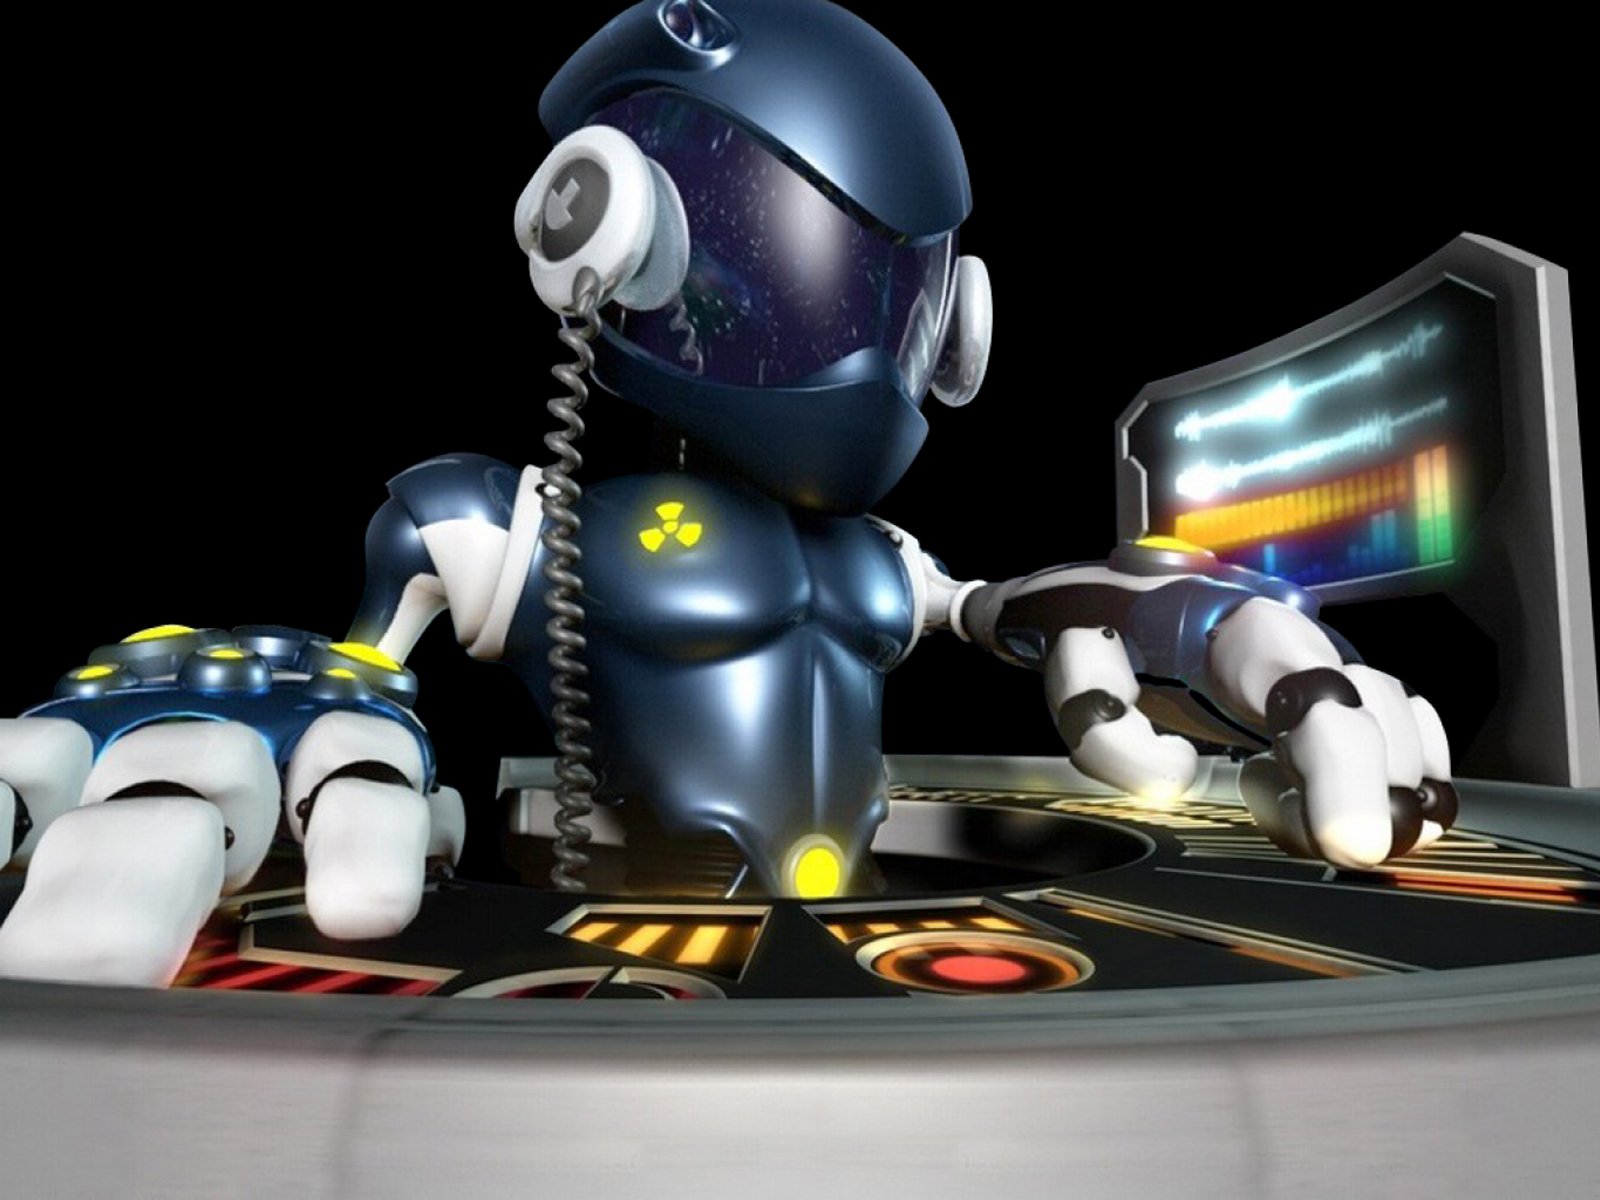 http://4.bp.blogspot.com/-26J-Utl66B8/T8hI0UKEAWI/AAAAAAAAAcs/VfdDSM4FEqQ/s1600/Robot-DJ-Wallpaper.jpg